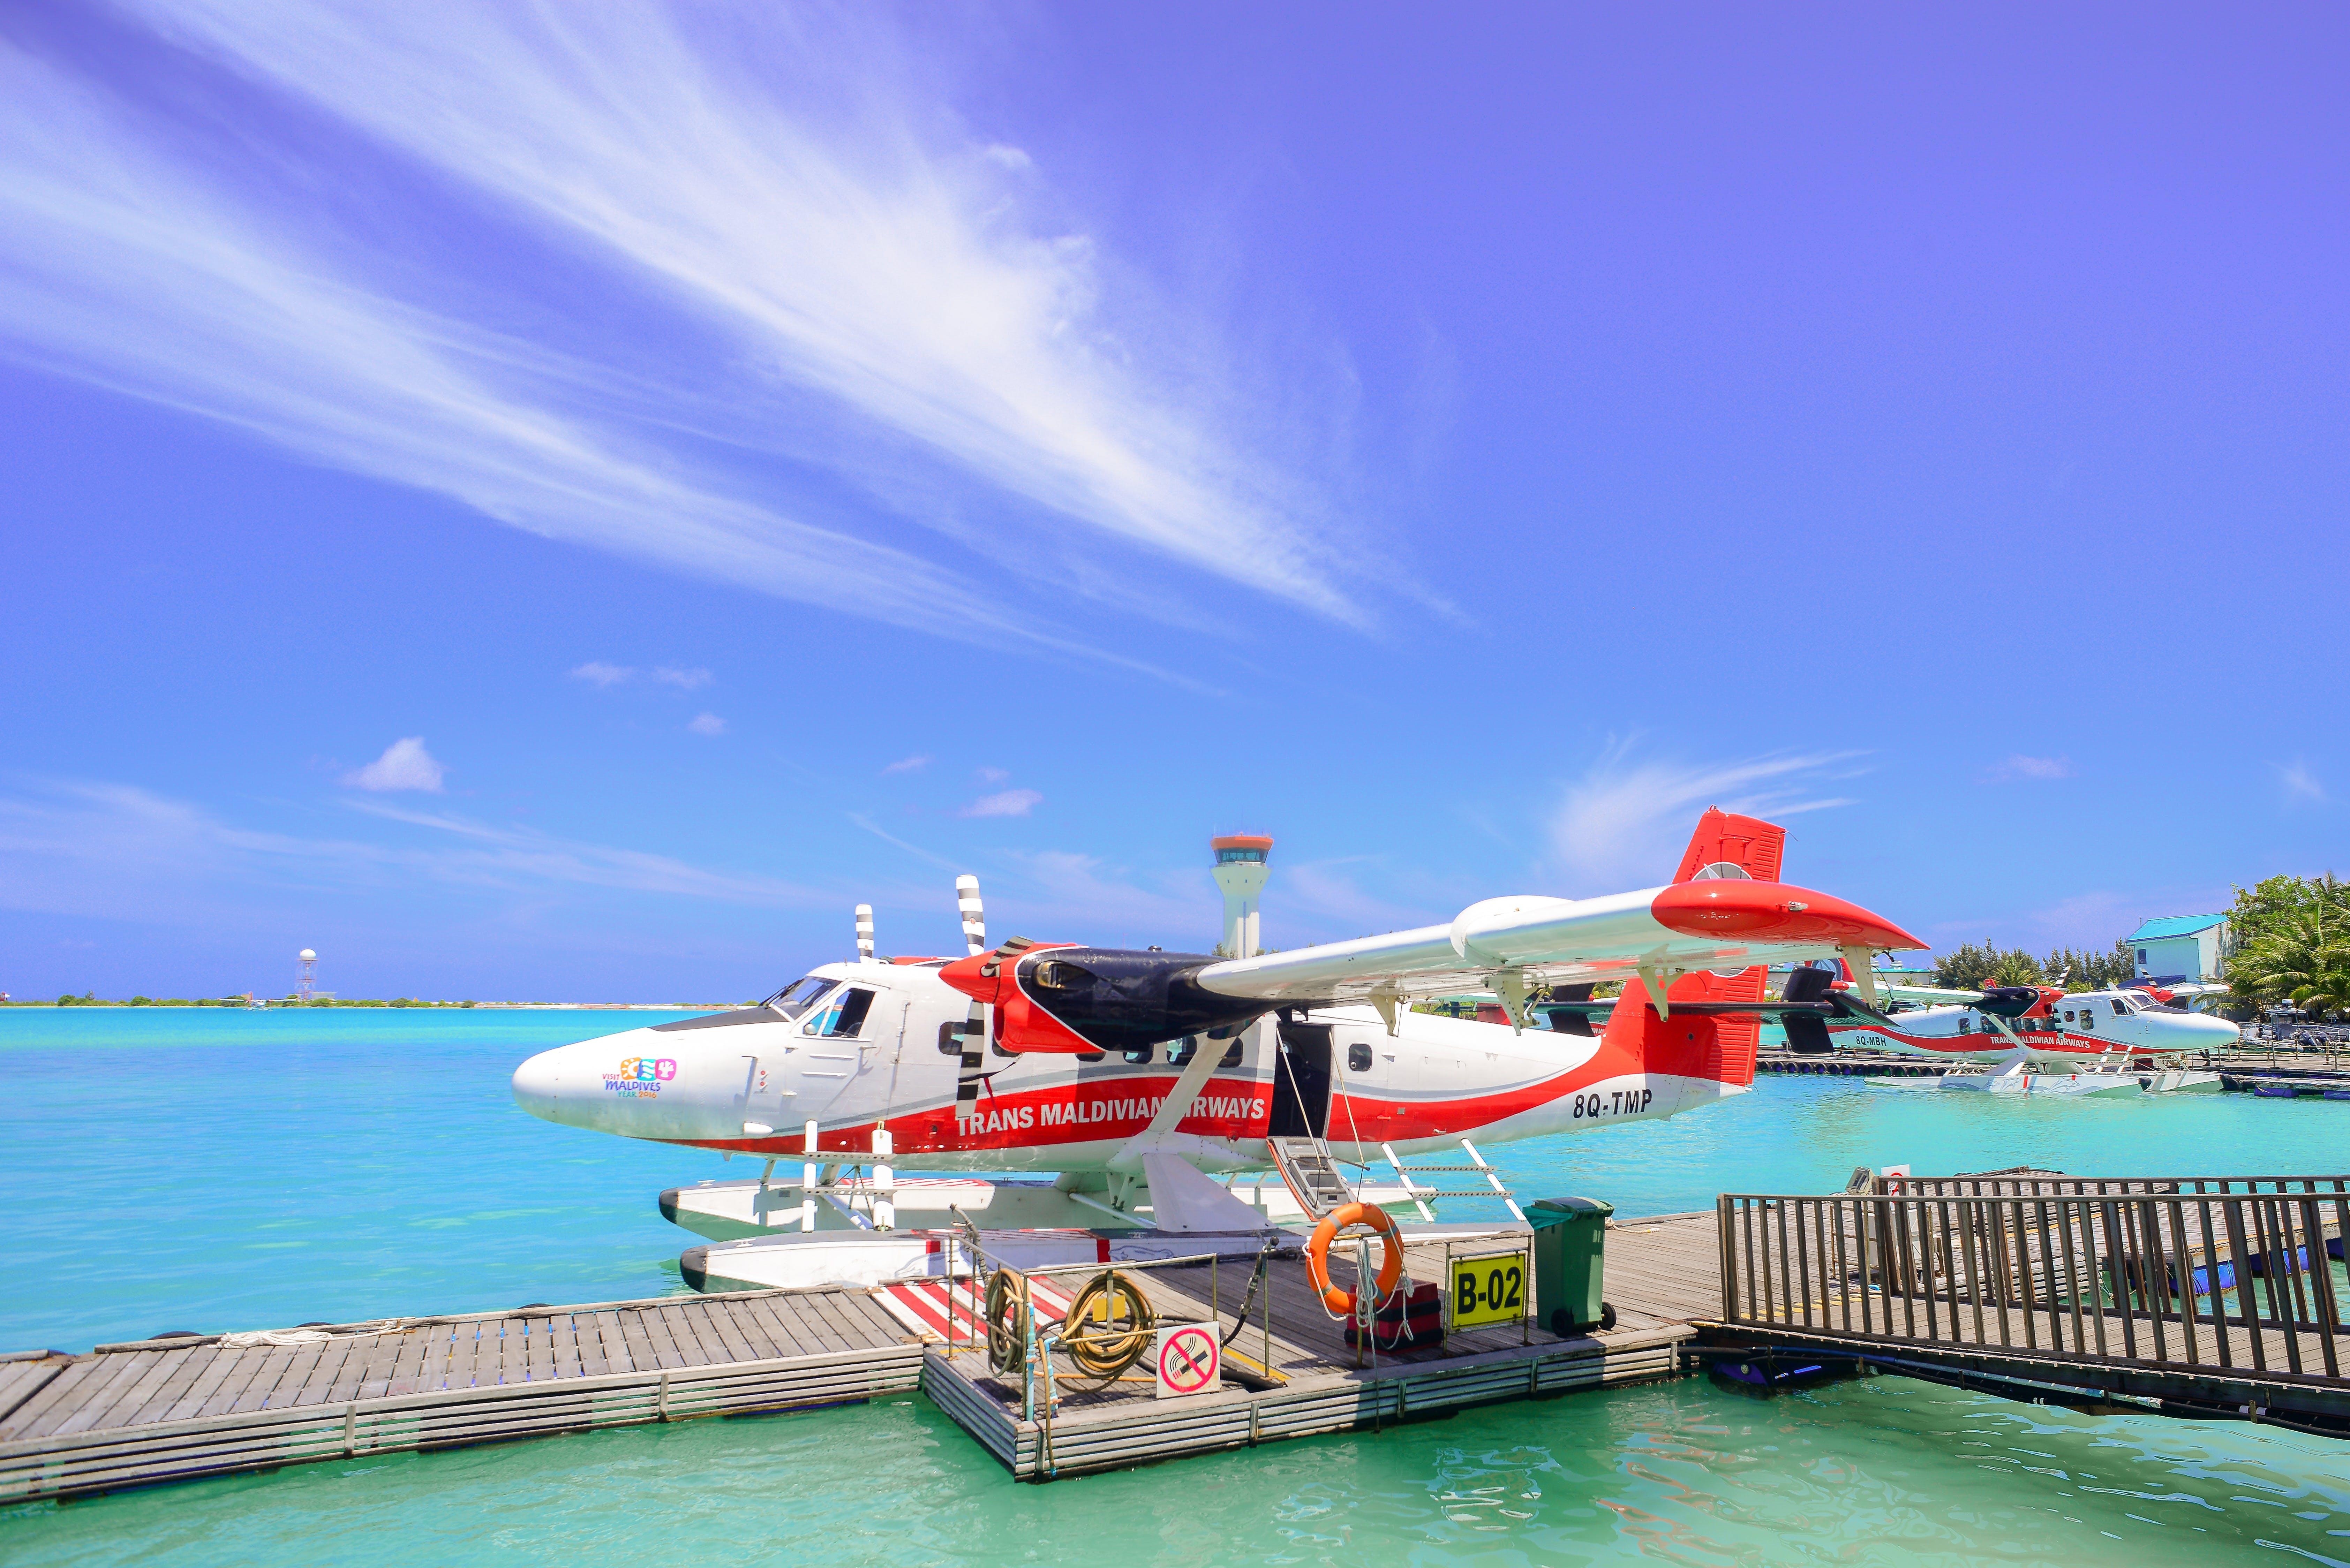 Photos gratuites de 8q-tmi, air, baie, bateau